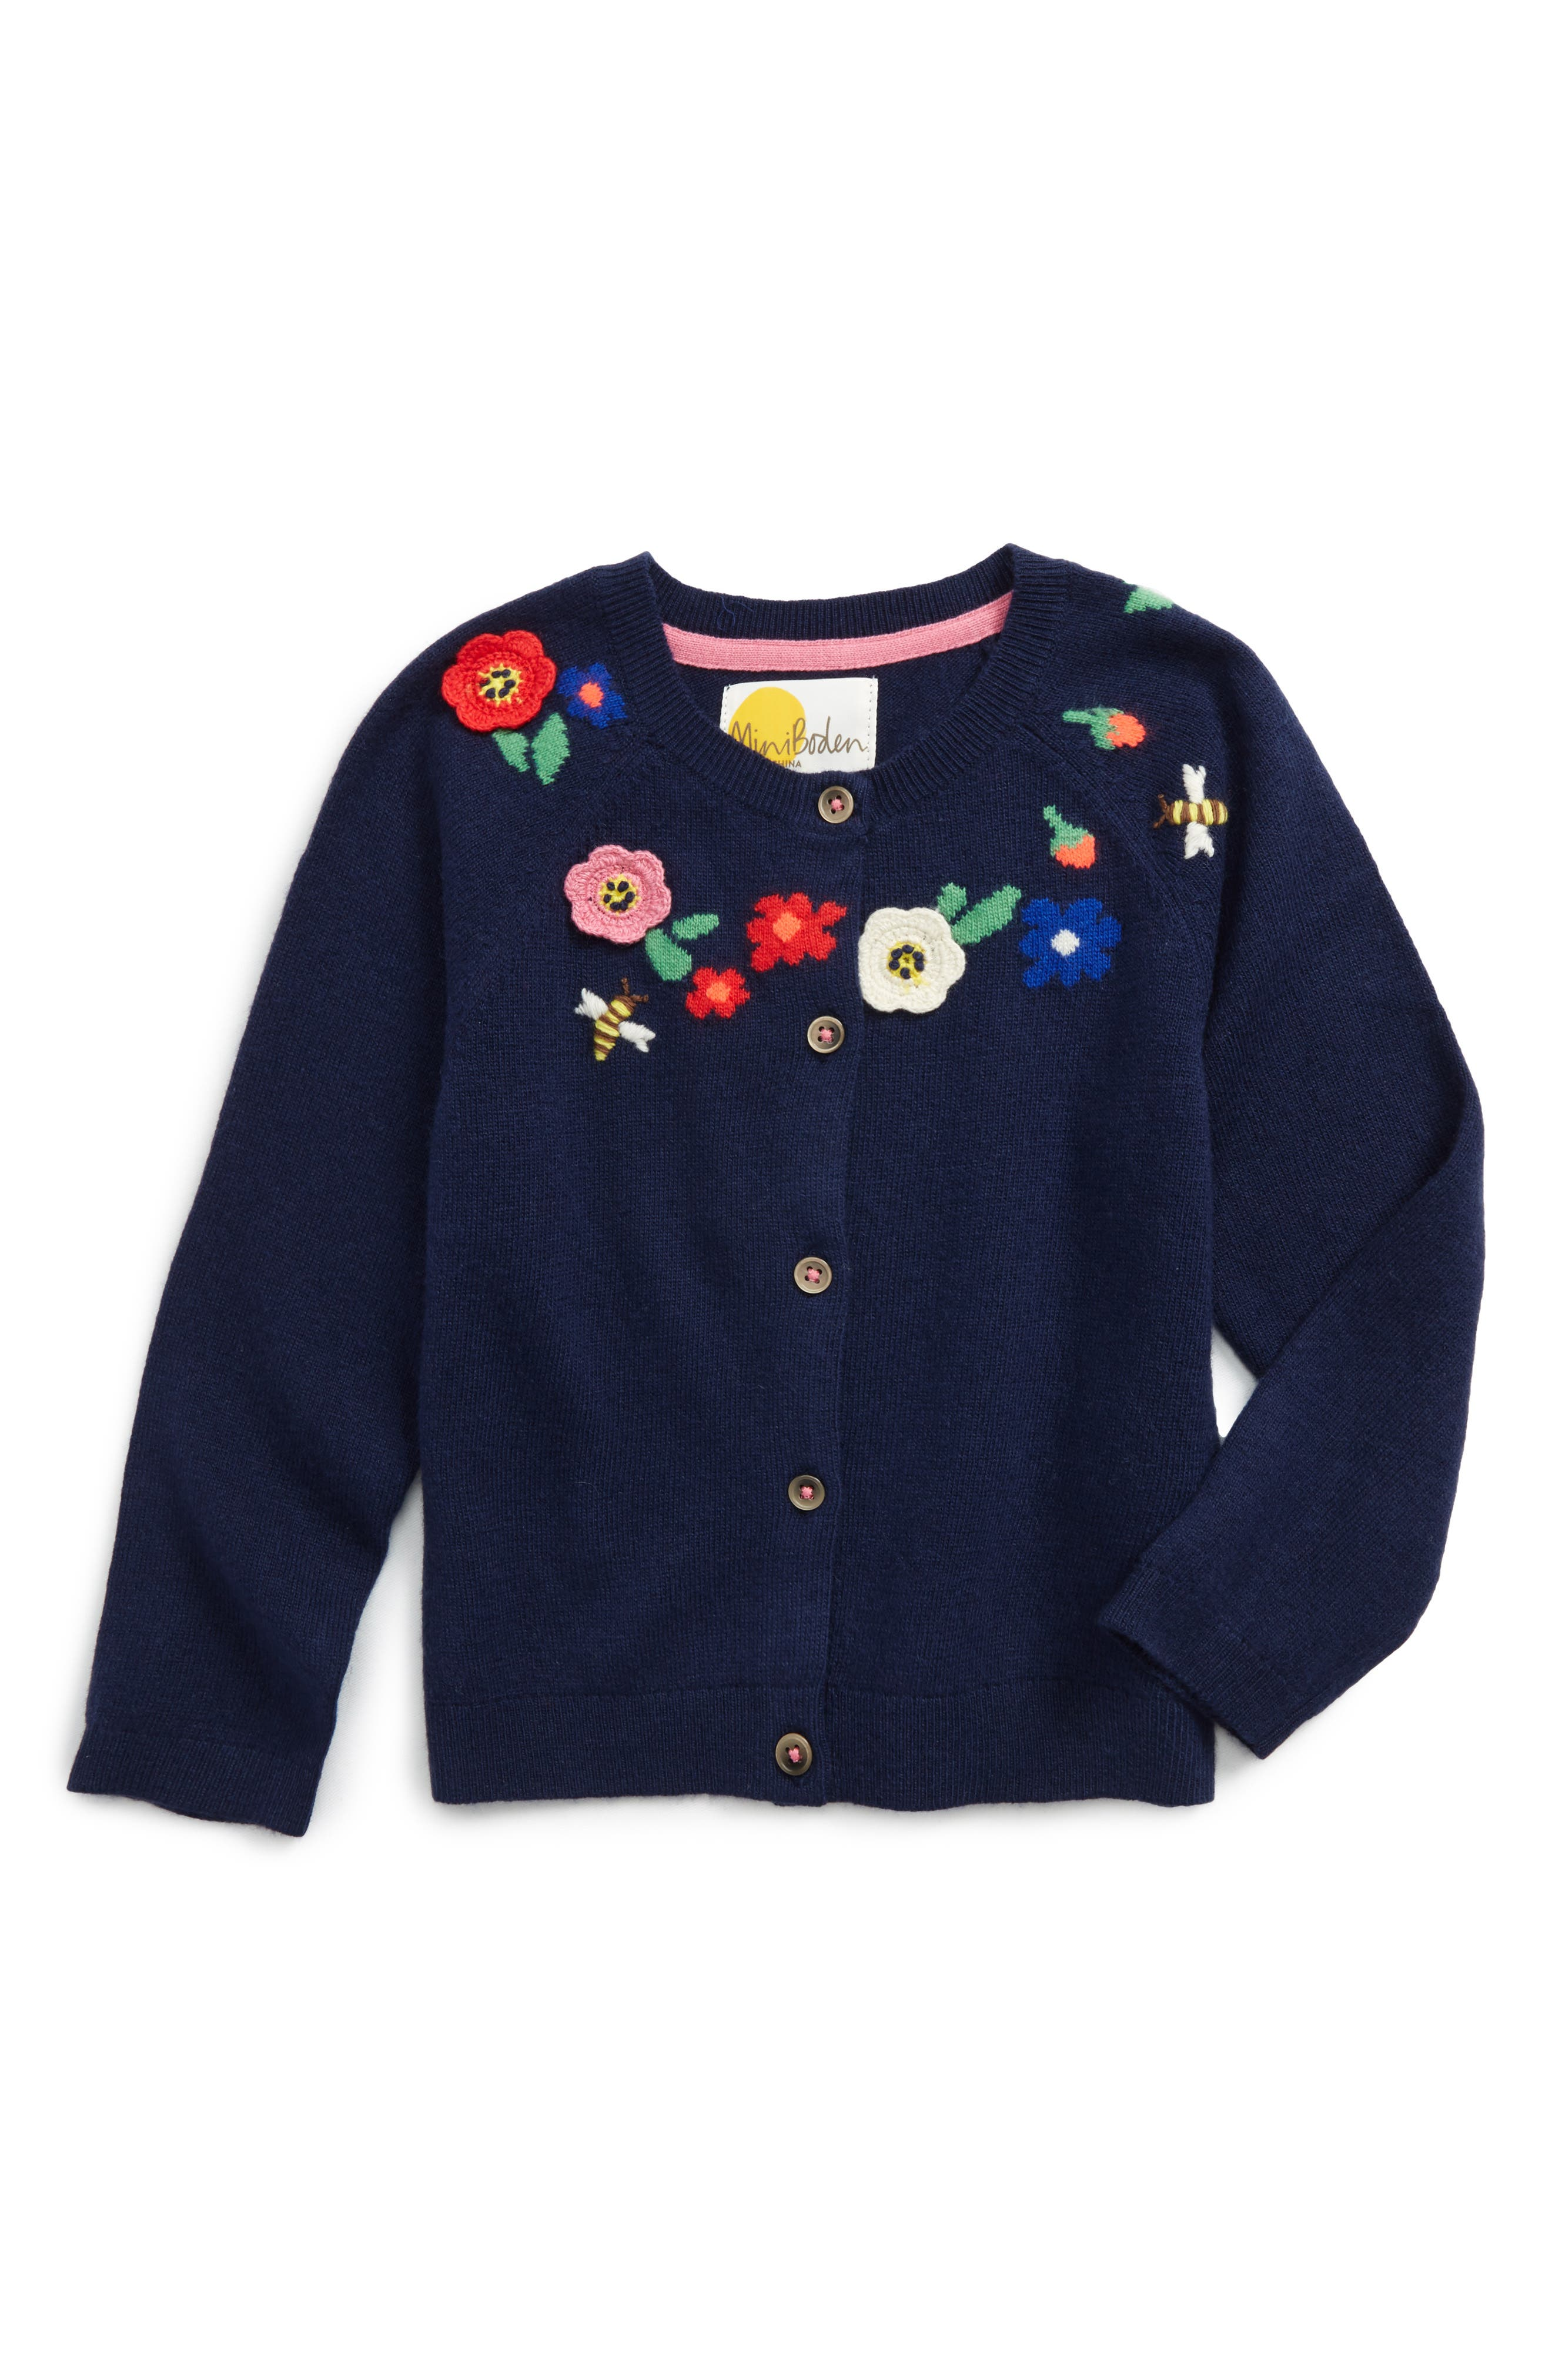 Main Image - Mini Boden Pretty Yoke Cardigan (Toddler Girls, Little Girls & Big Girls)